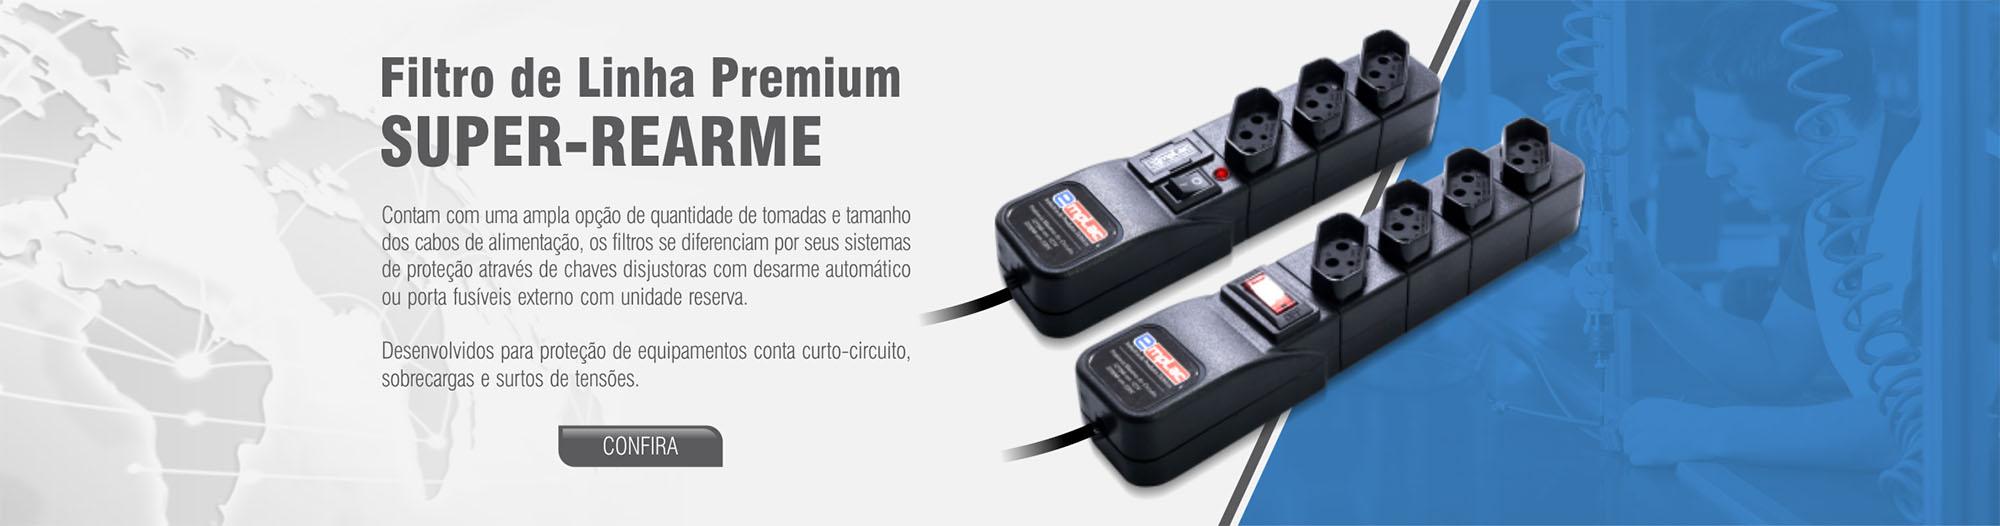 Filtro de Linha Premium